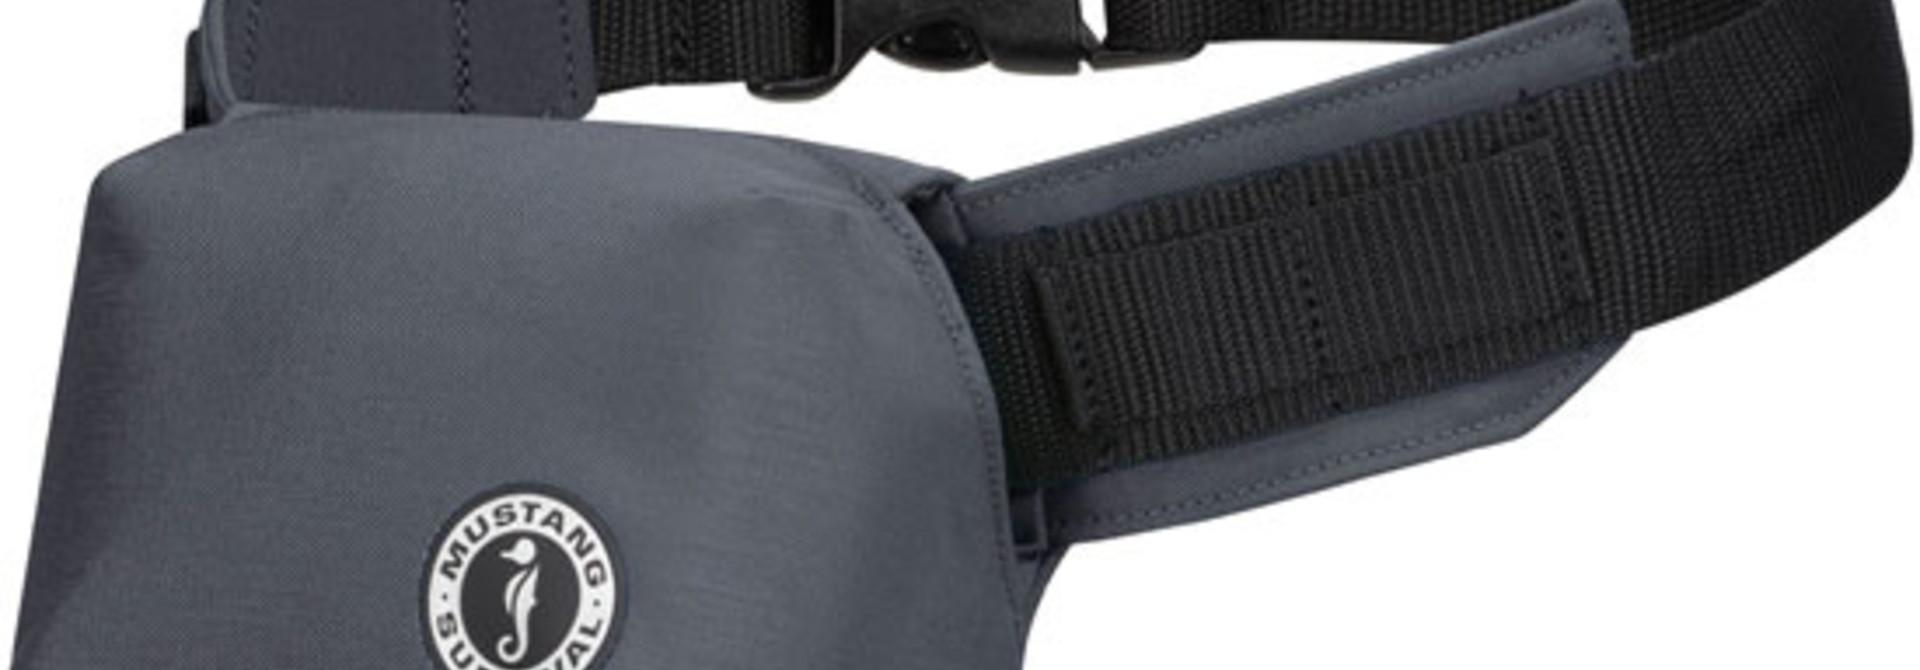 Mustang Minimalist Belt Pack